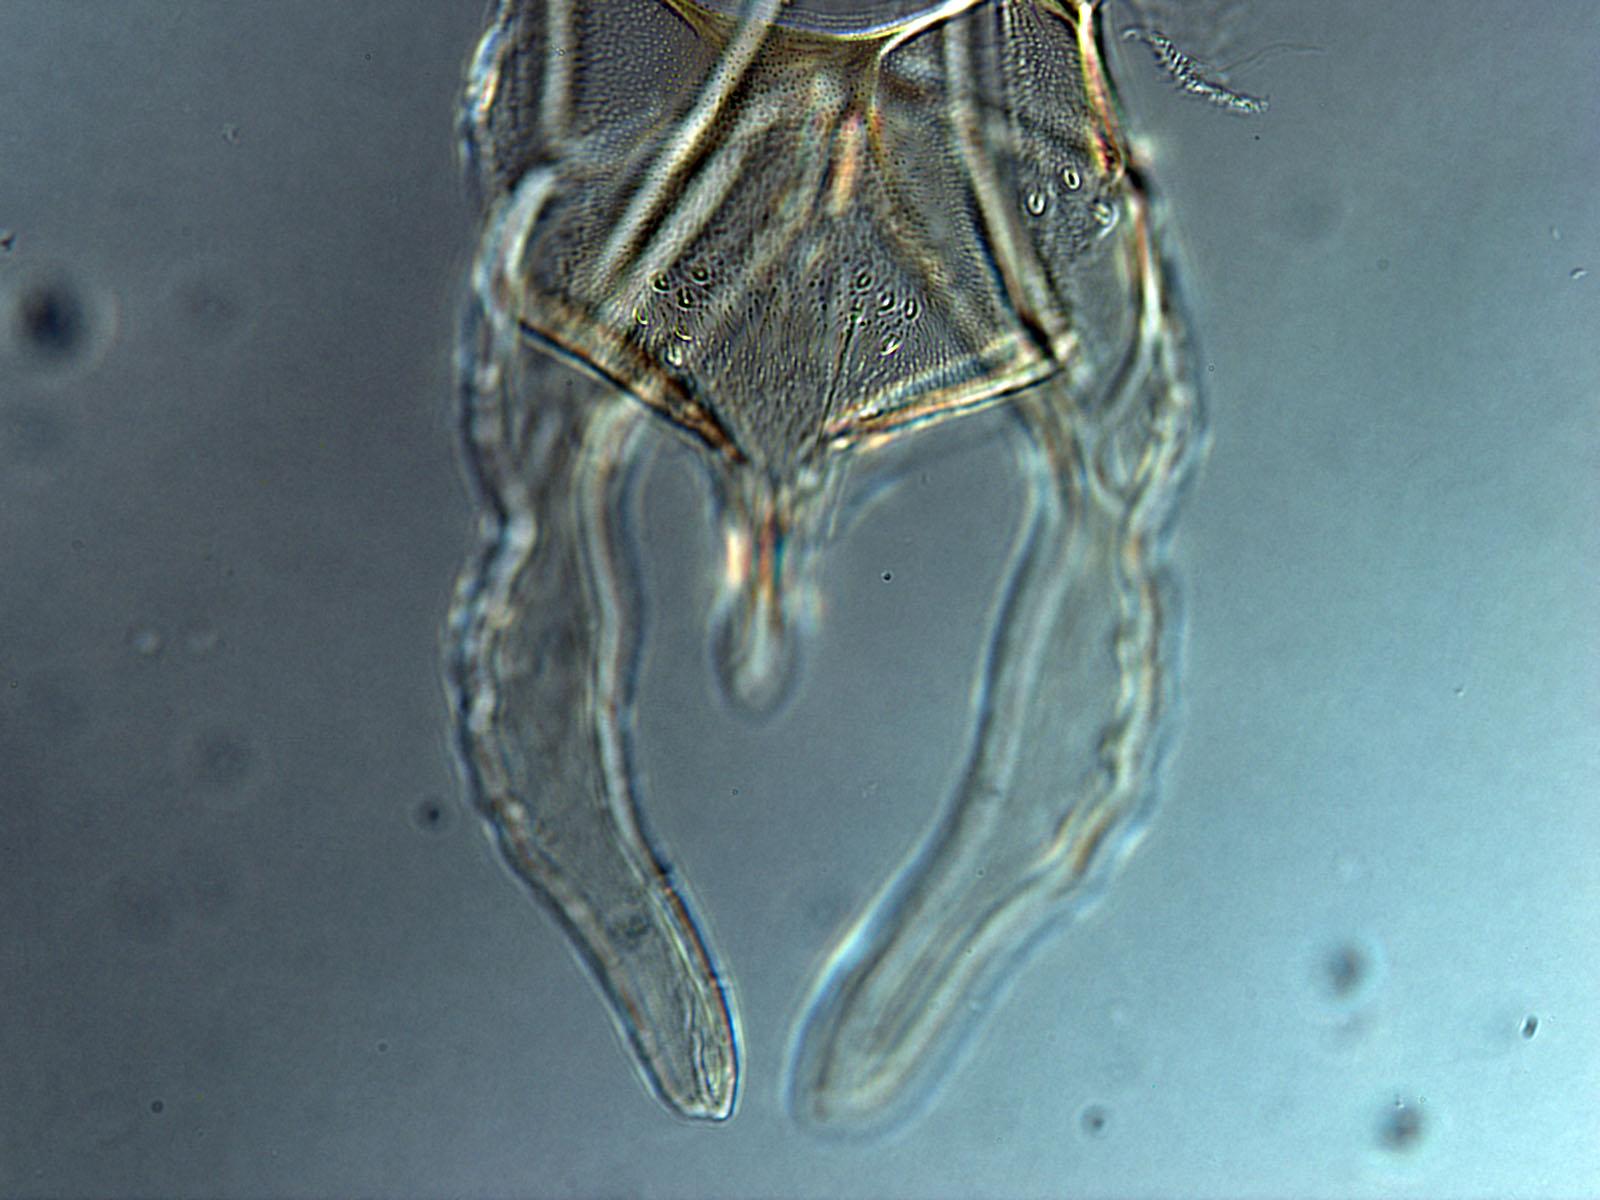 1 Cladopelma viridulum nt1.jpg